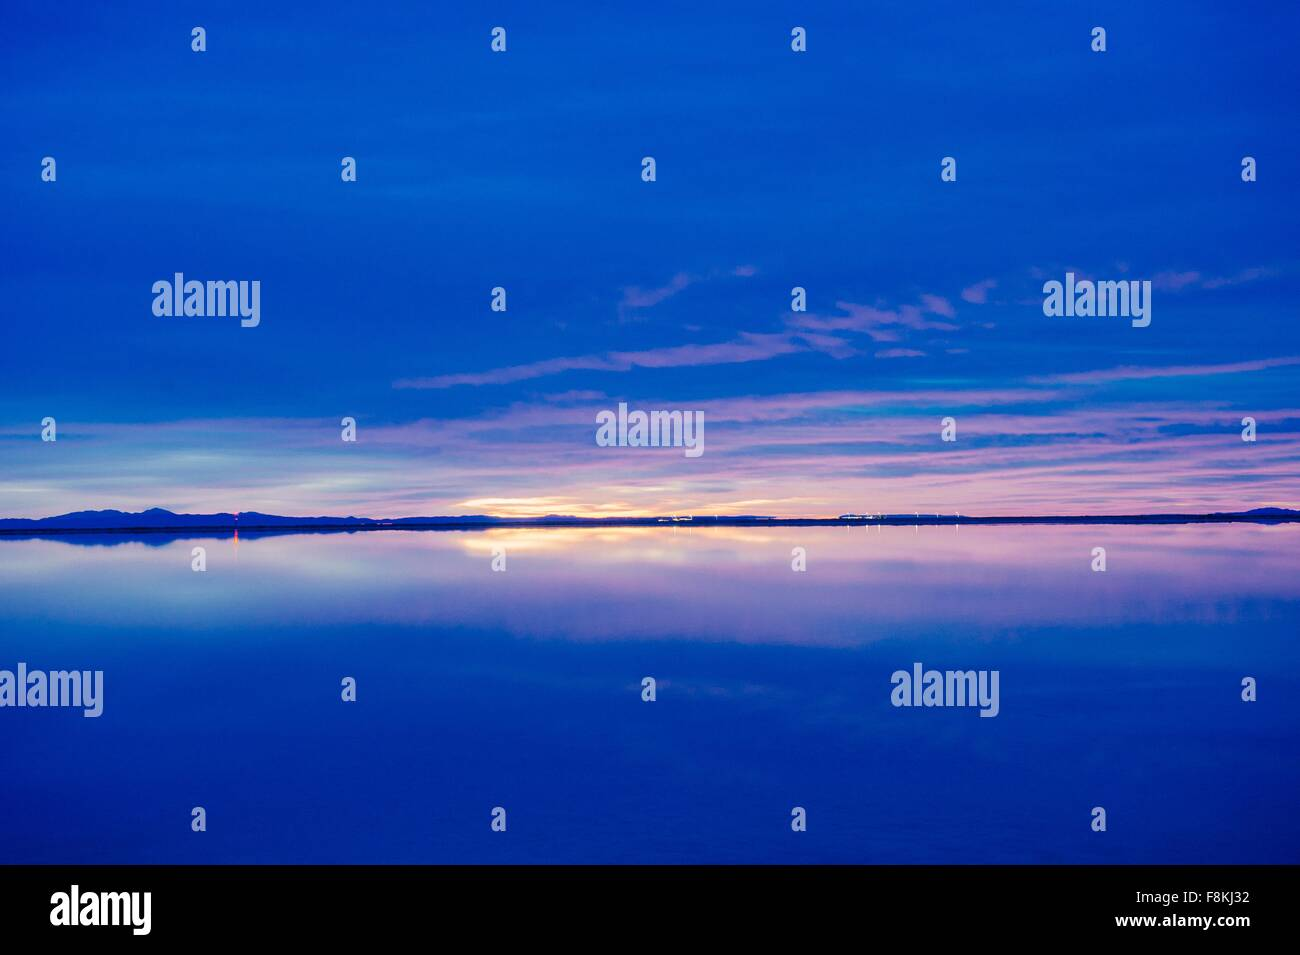 Reflection pool of horizon over water, blue evening sky and sunset, Bonneville, Utah, USA - Stock Image